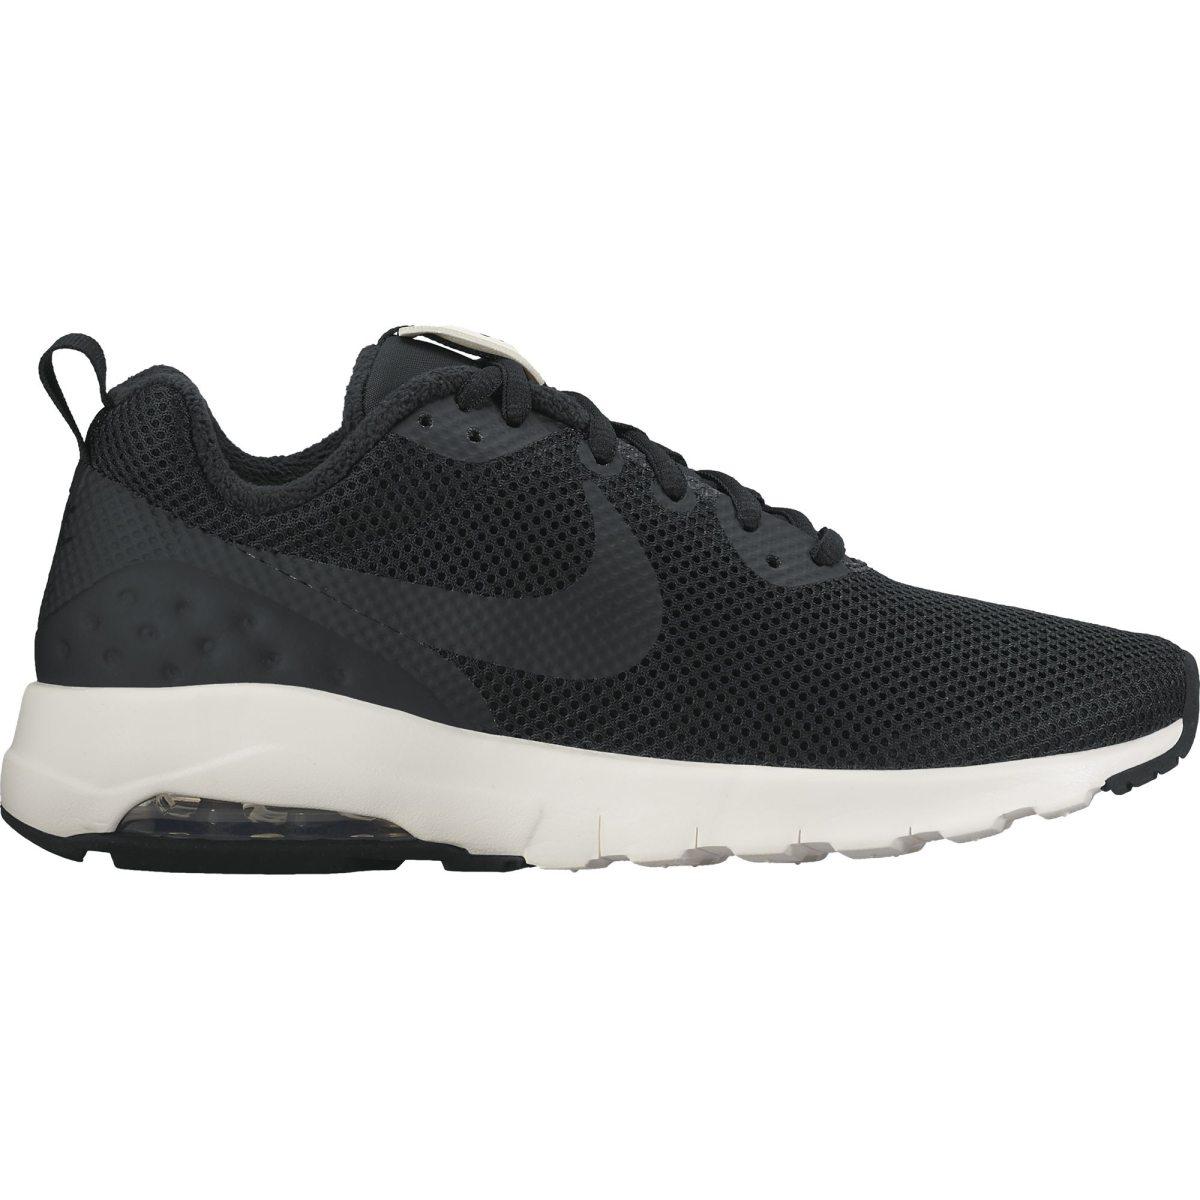 3fbcf301d86607 nike air max motion lw se fritidssko dam fritidsskor   sneakers